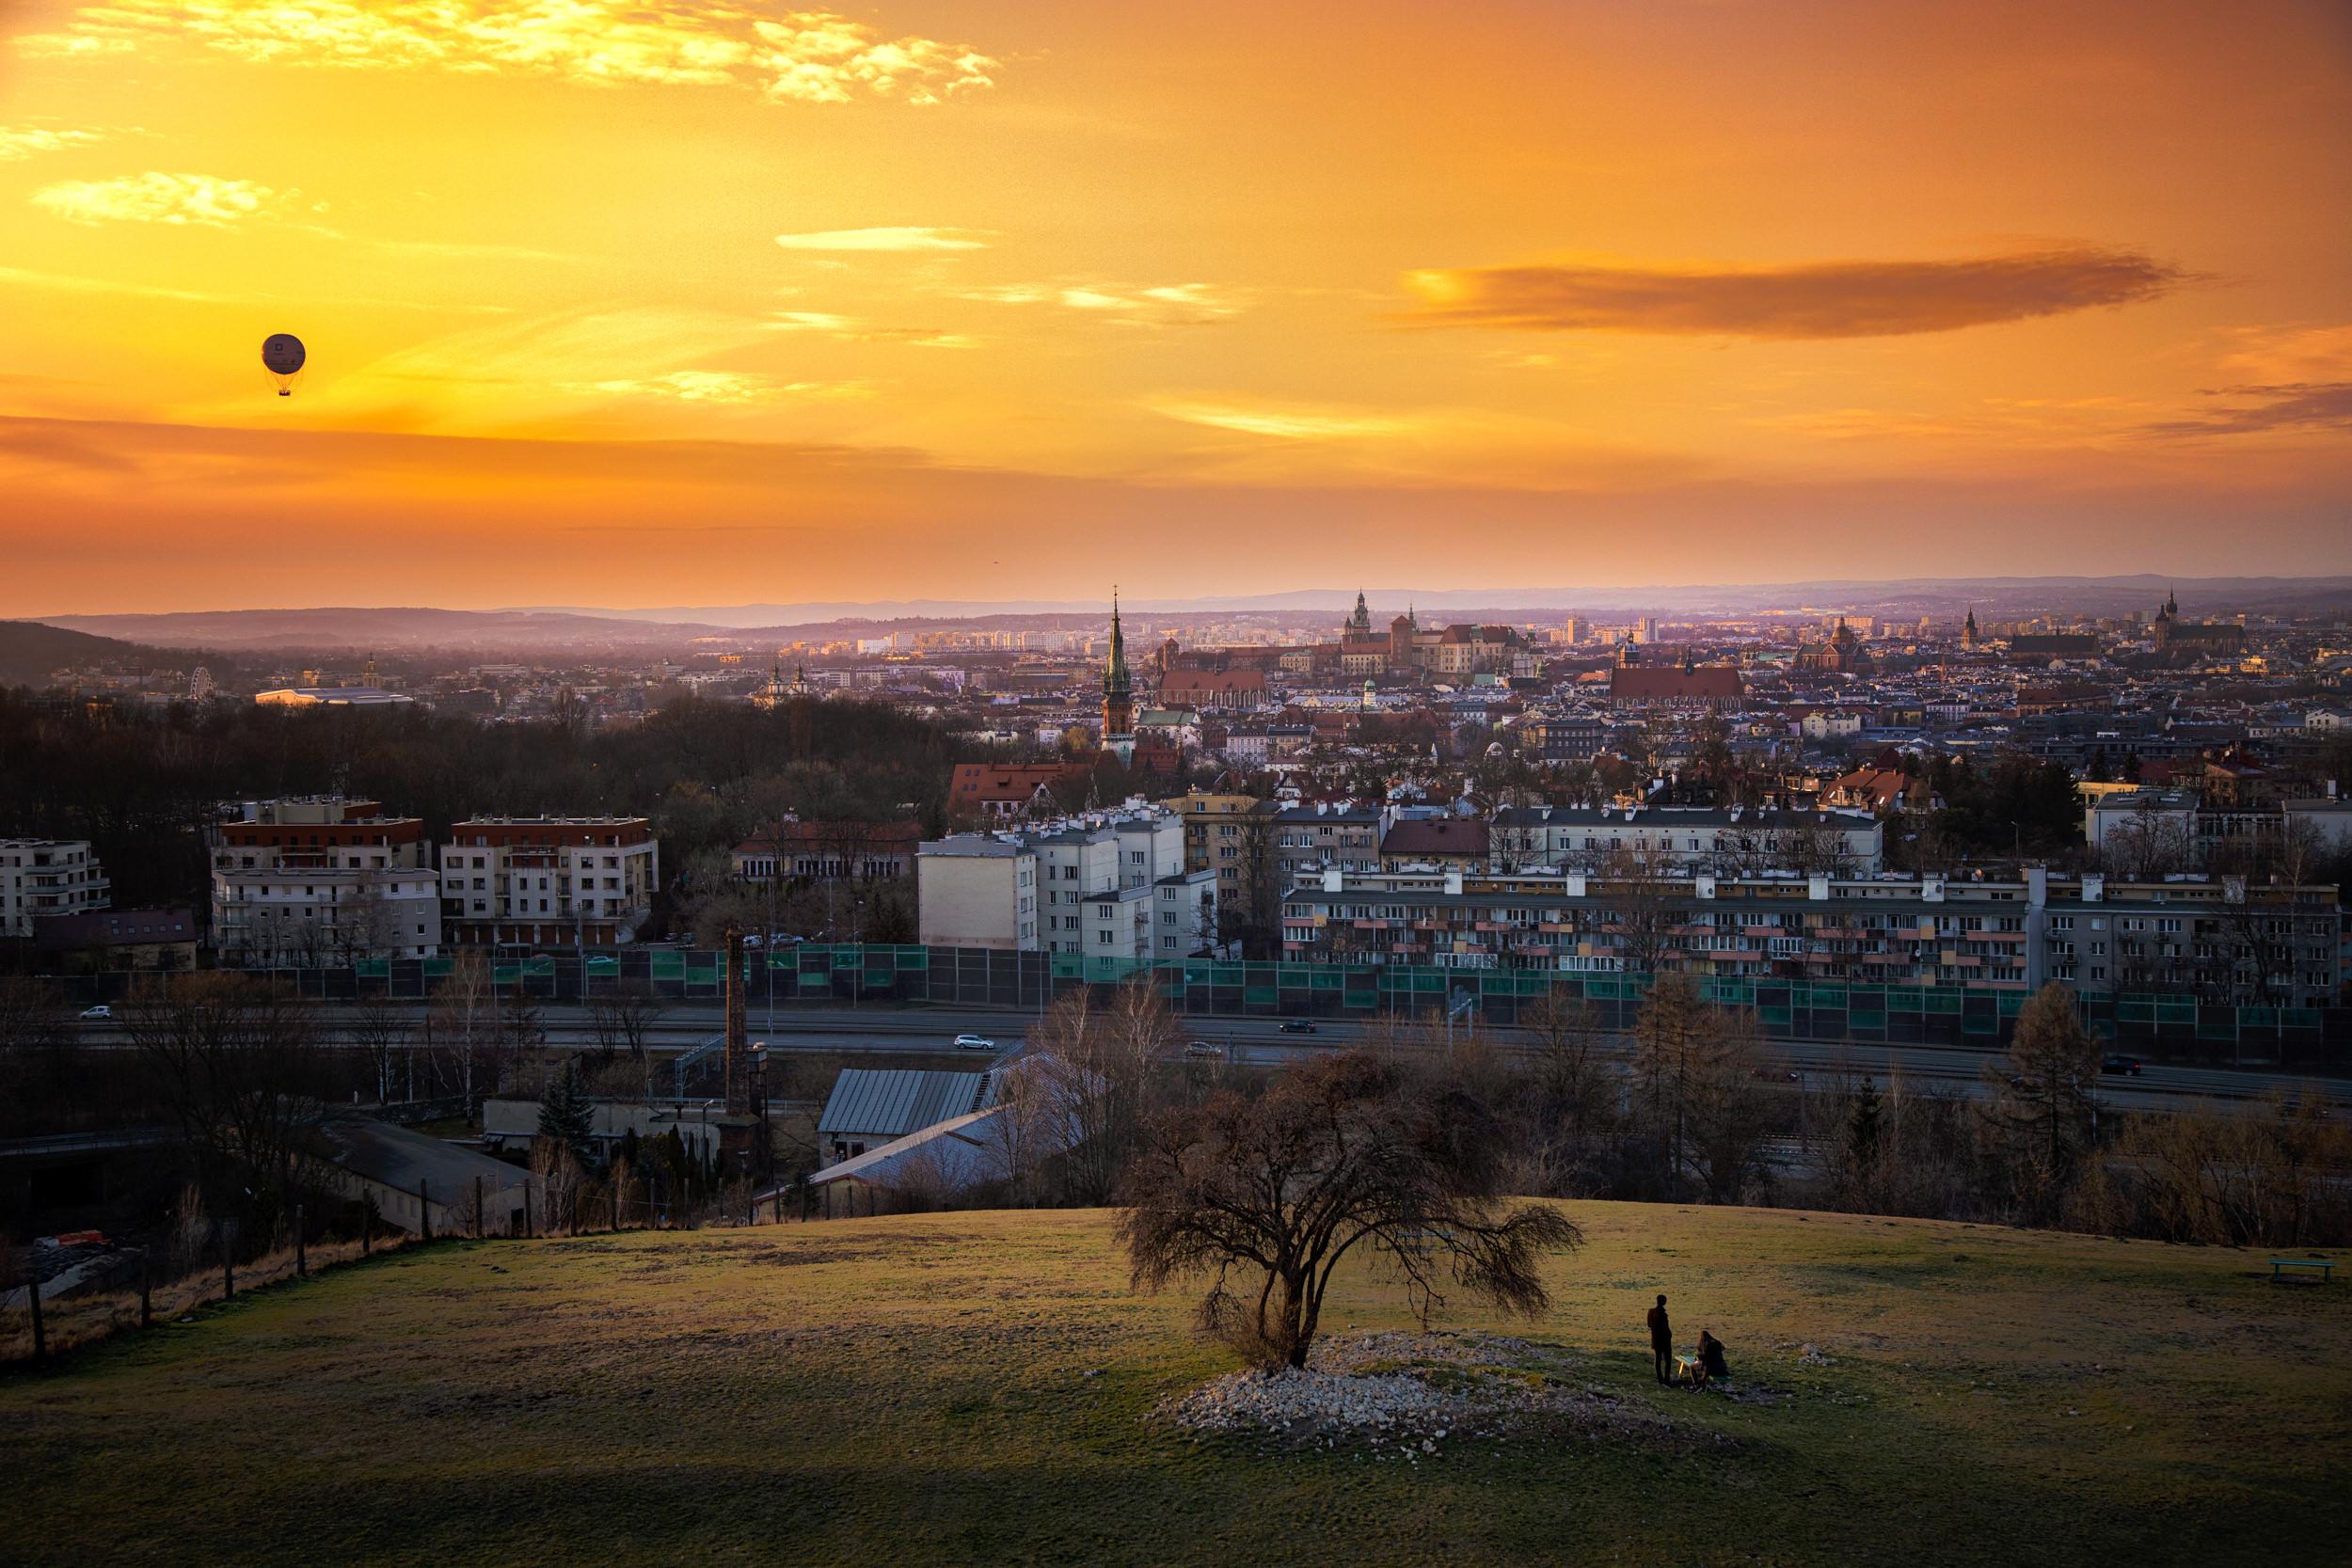 Landschaftsfotografie fotograf filmemacher frankfurt patrick schmetzer drohne landschaft natur 64